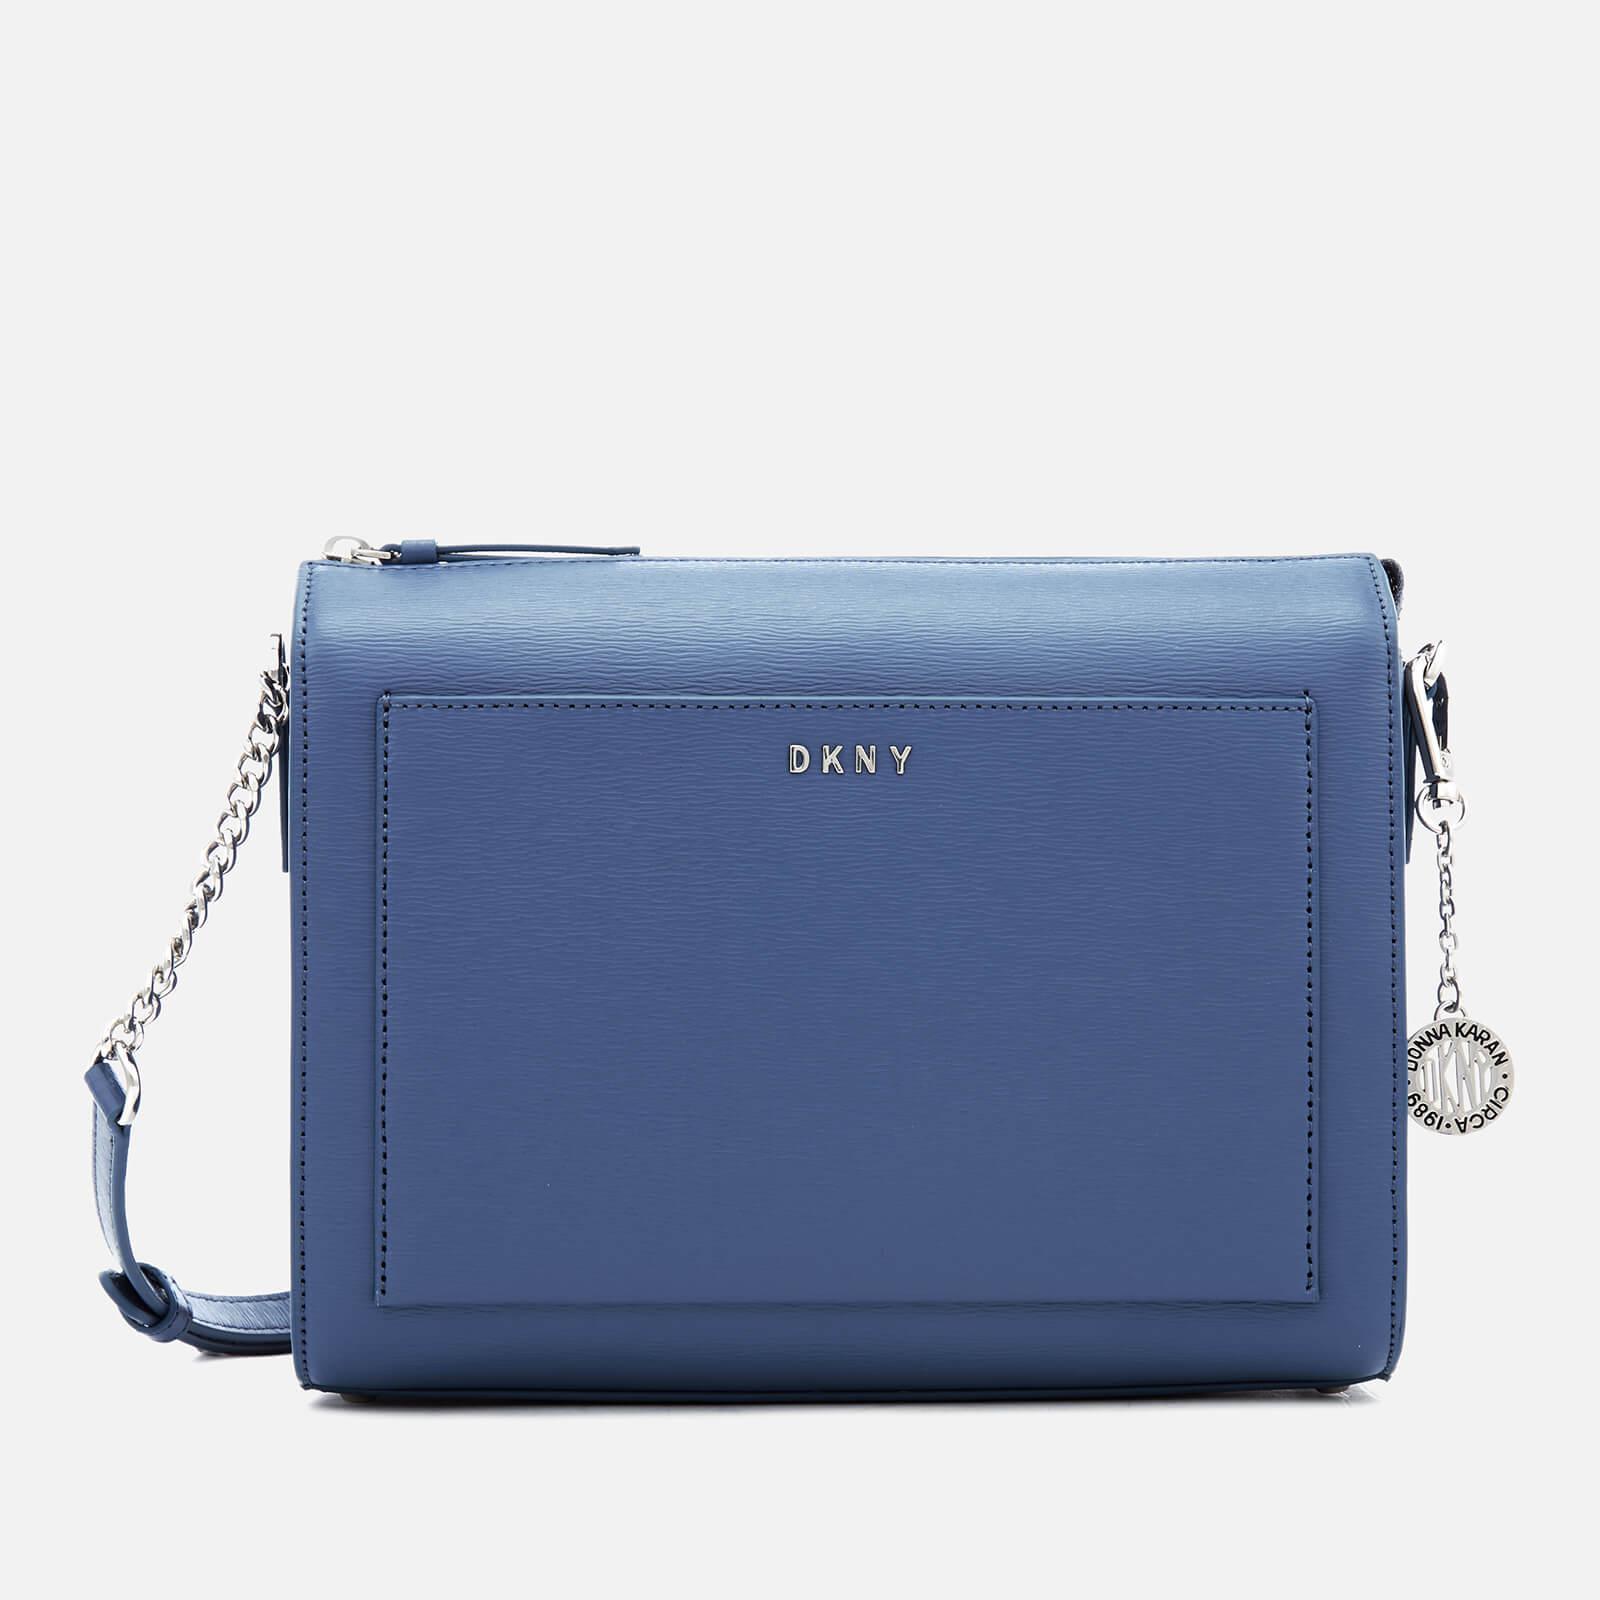 DKNY Bryant Medium Leather Box Cross Body Bag, Safari